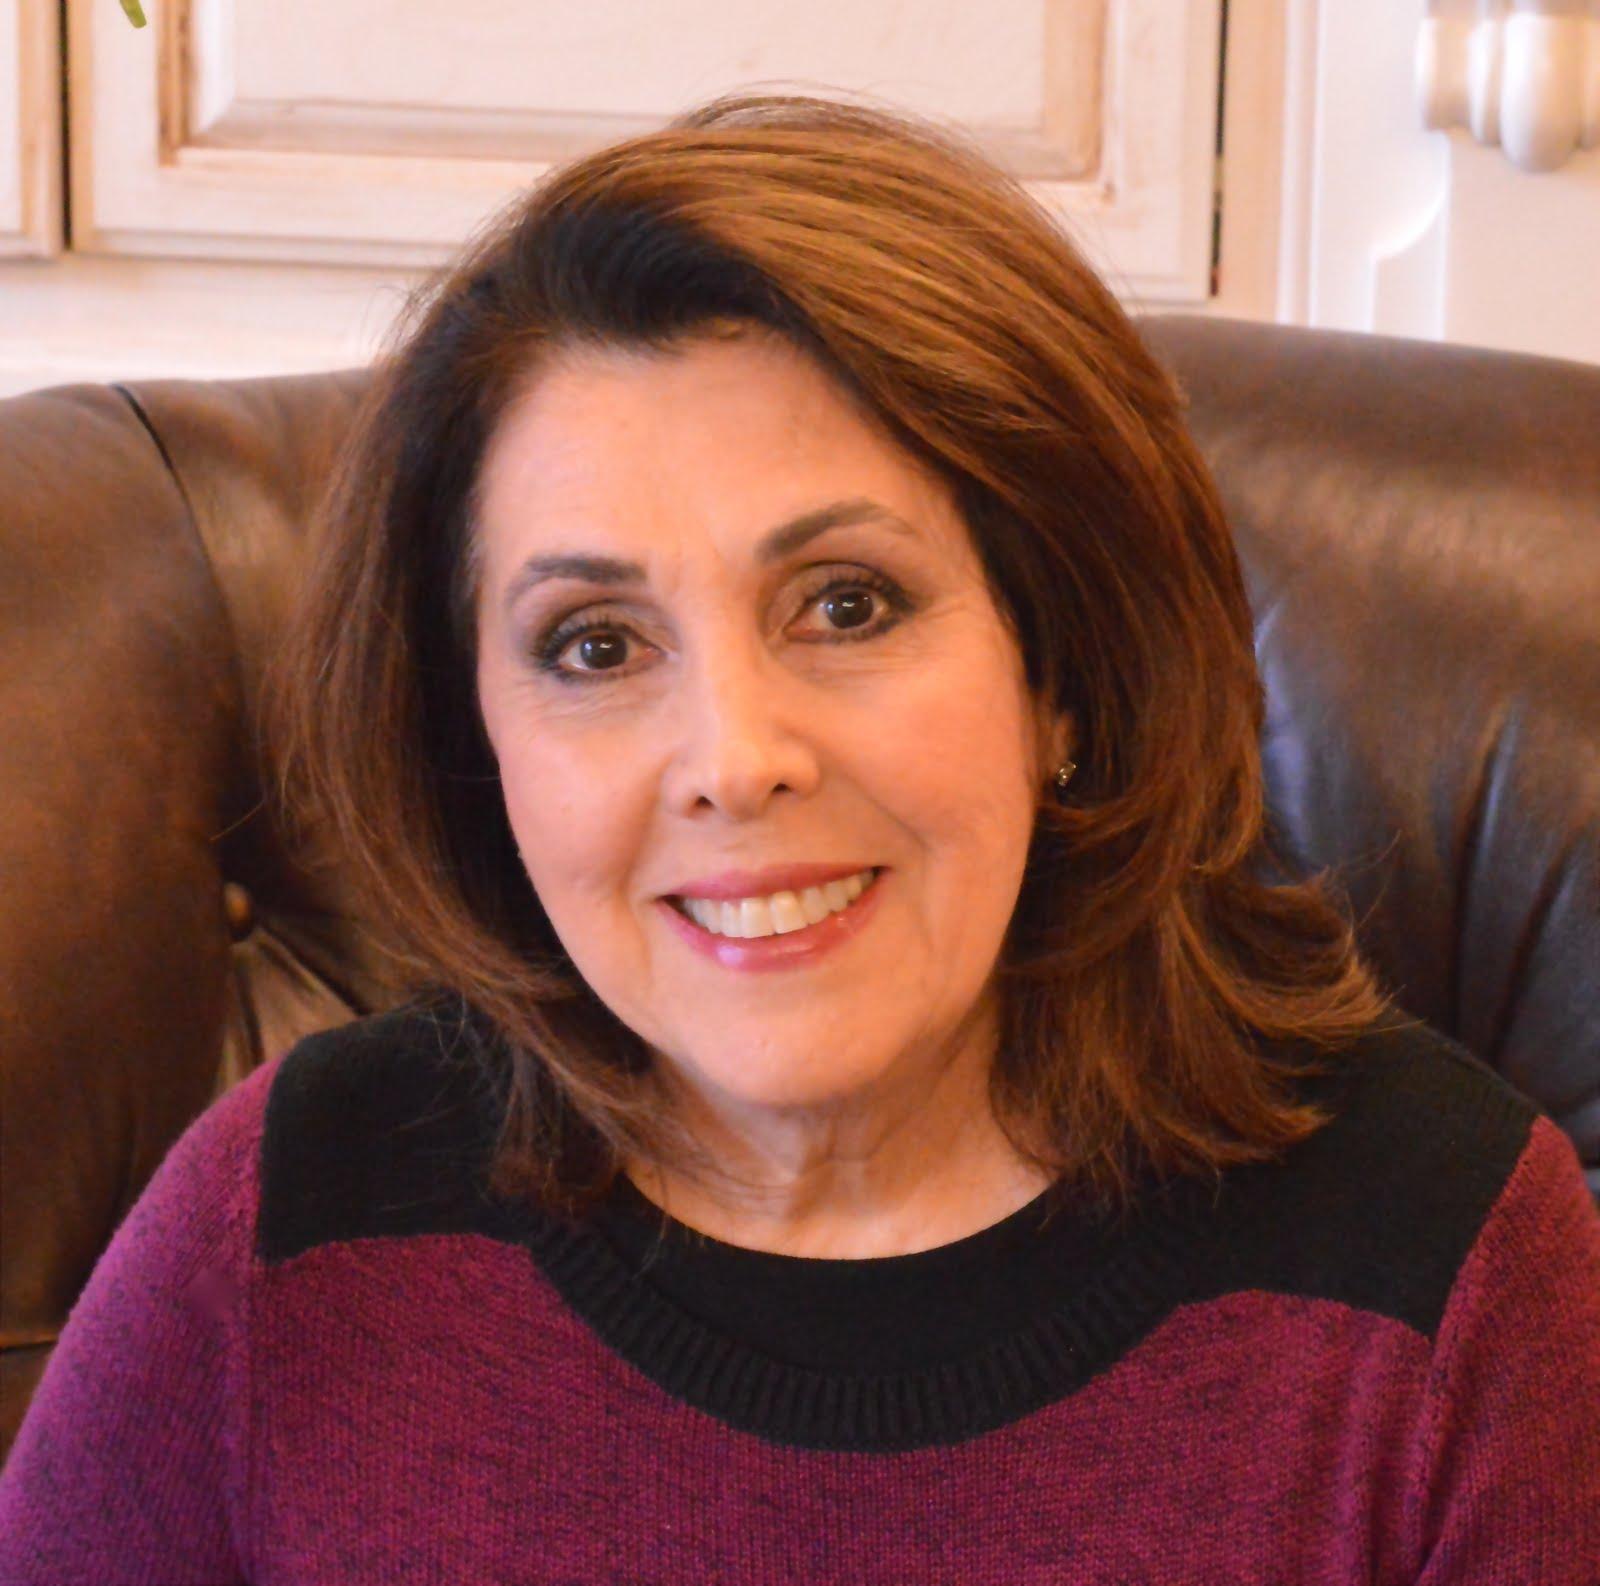 Nancy Penir